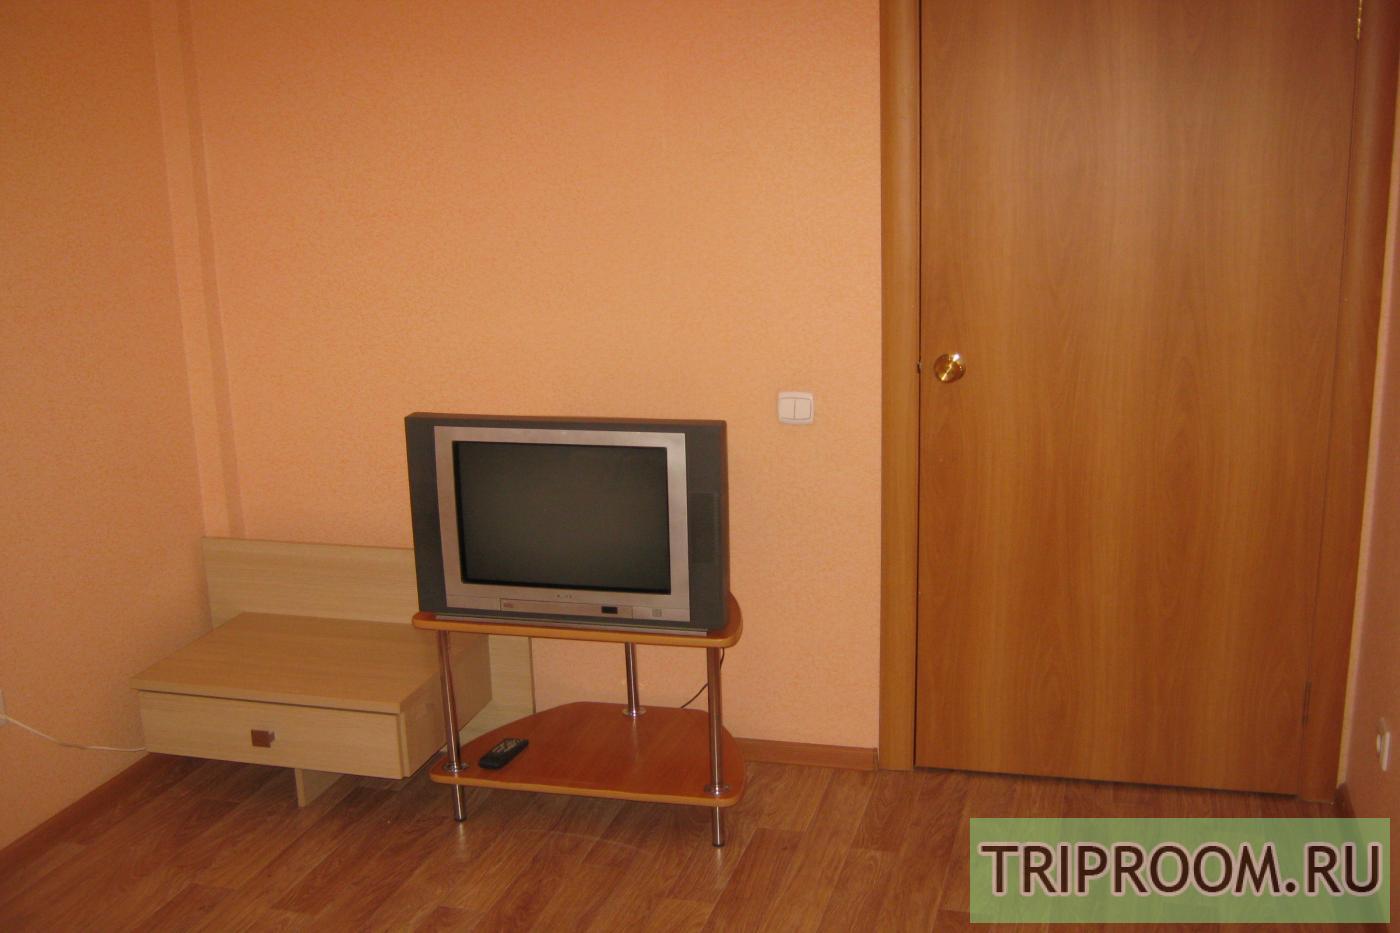 2-комнатная квартира посуточно (вариант № 5897), ул. Алексеева улица, фото № 3